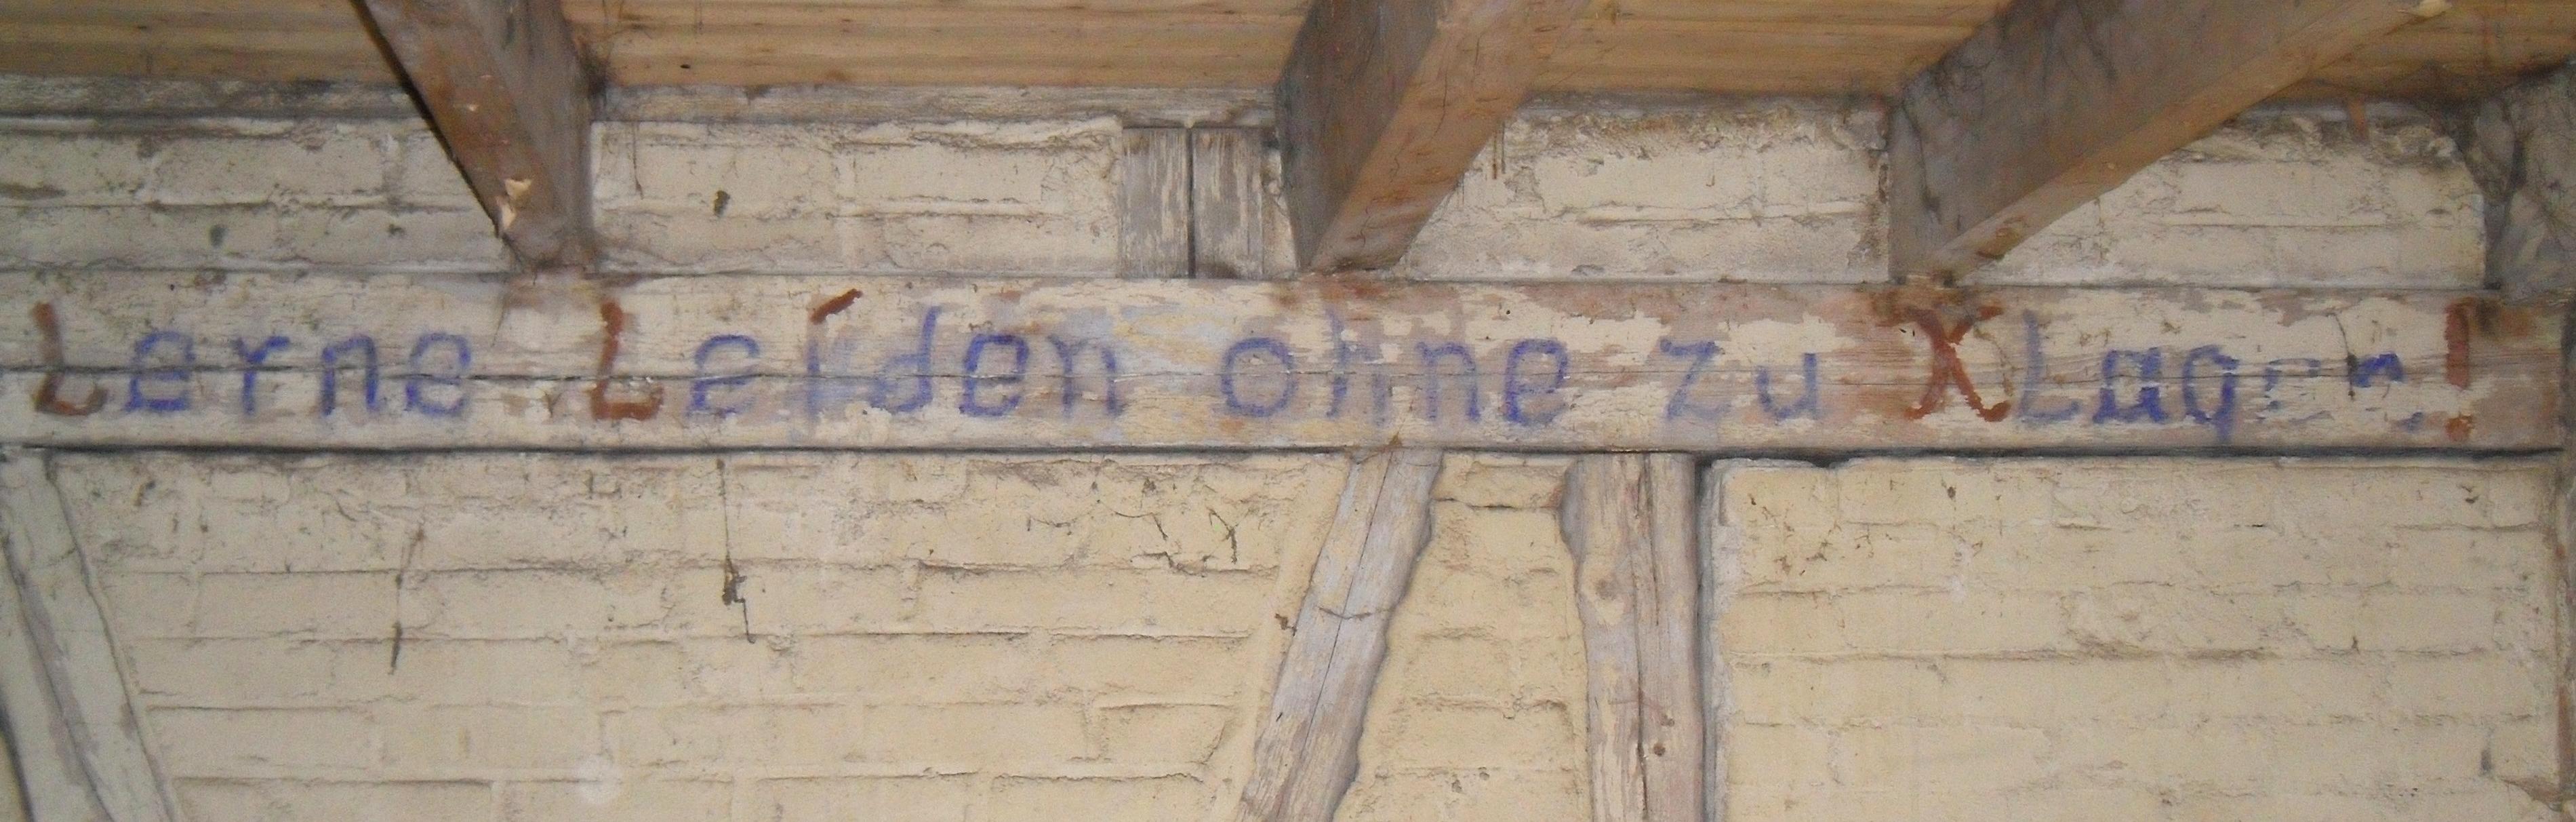 The inscription means